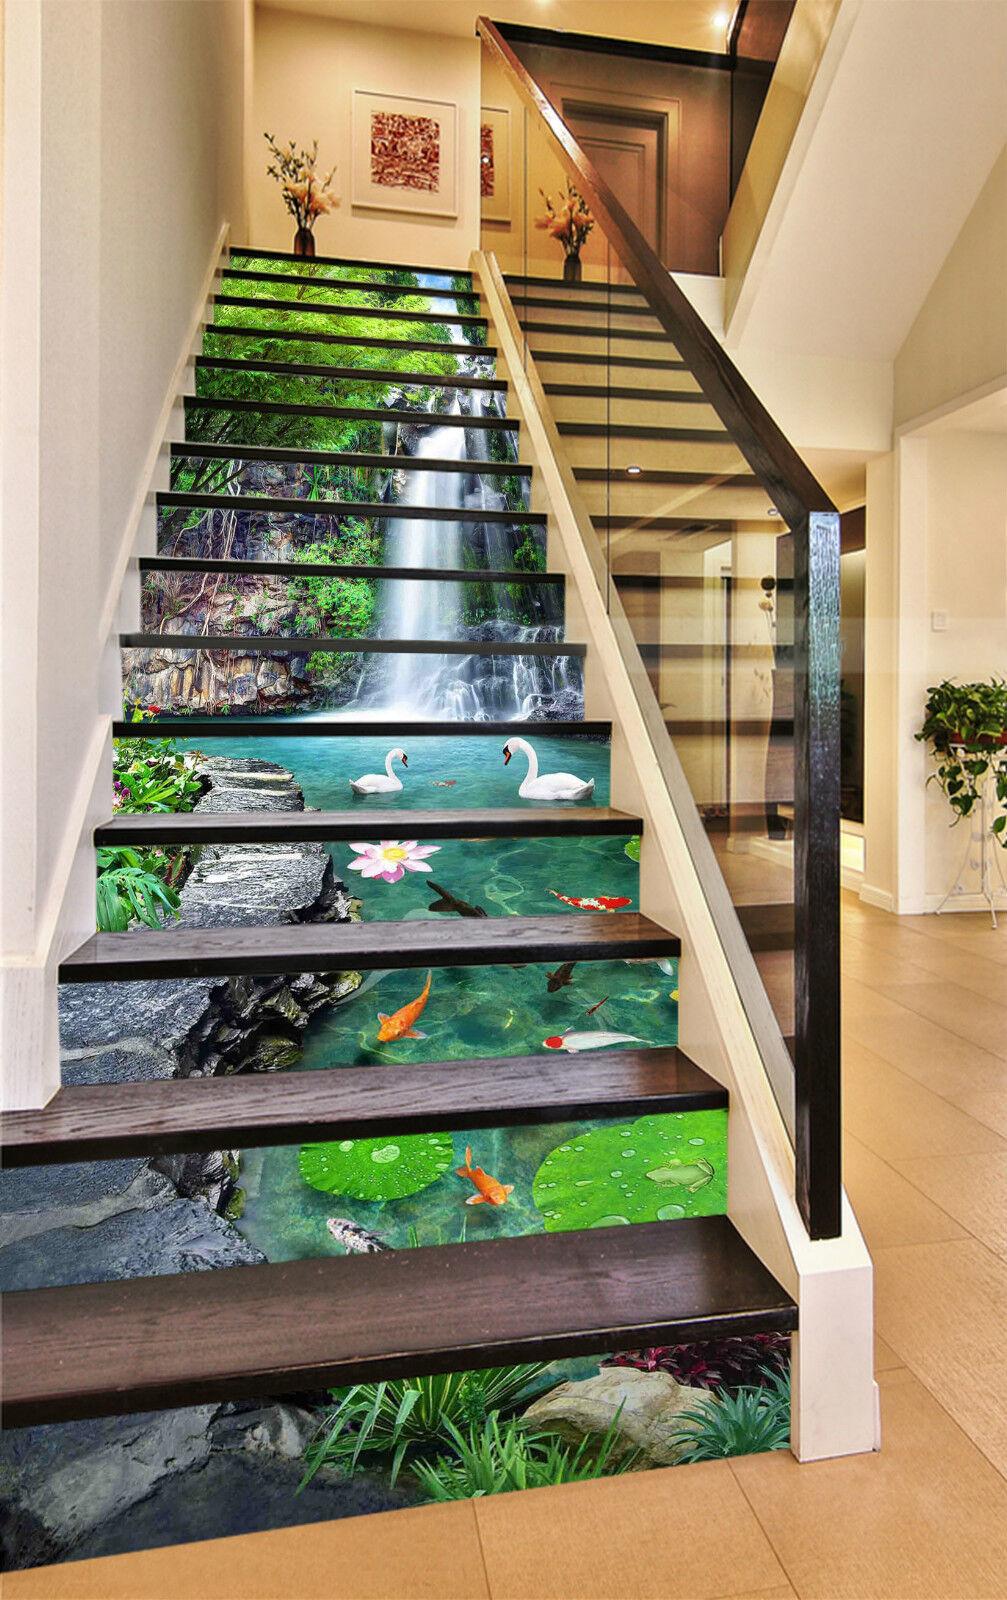 3D Grn Wald 864 Stair Risers Dekoration Fototapete Vinyl Aufkleber Tapete DE